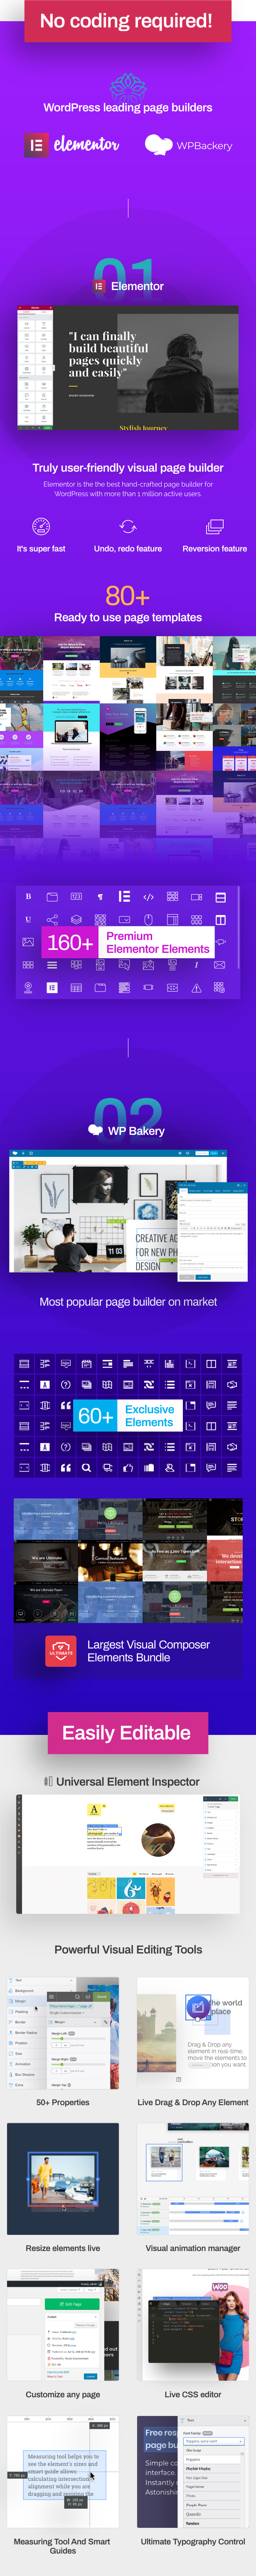 Phlox Pro - Elementor MultiPurpose WordPress Theme - 4